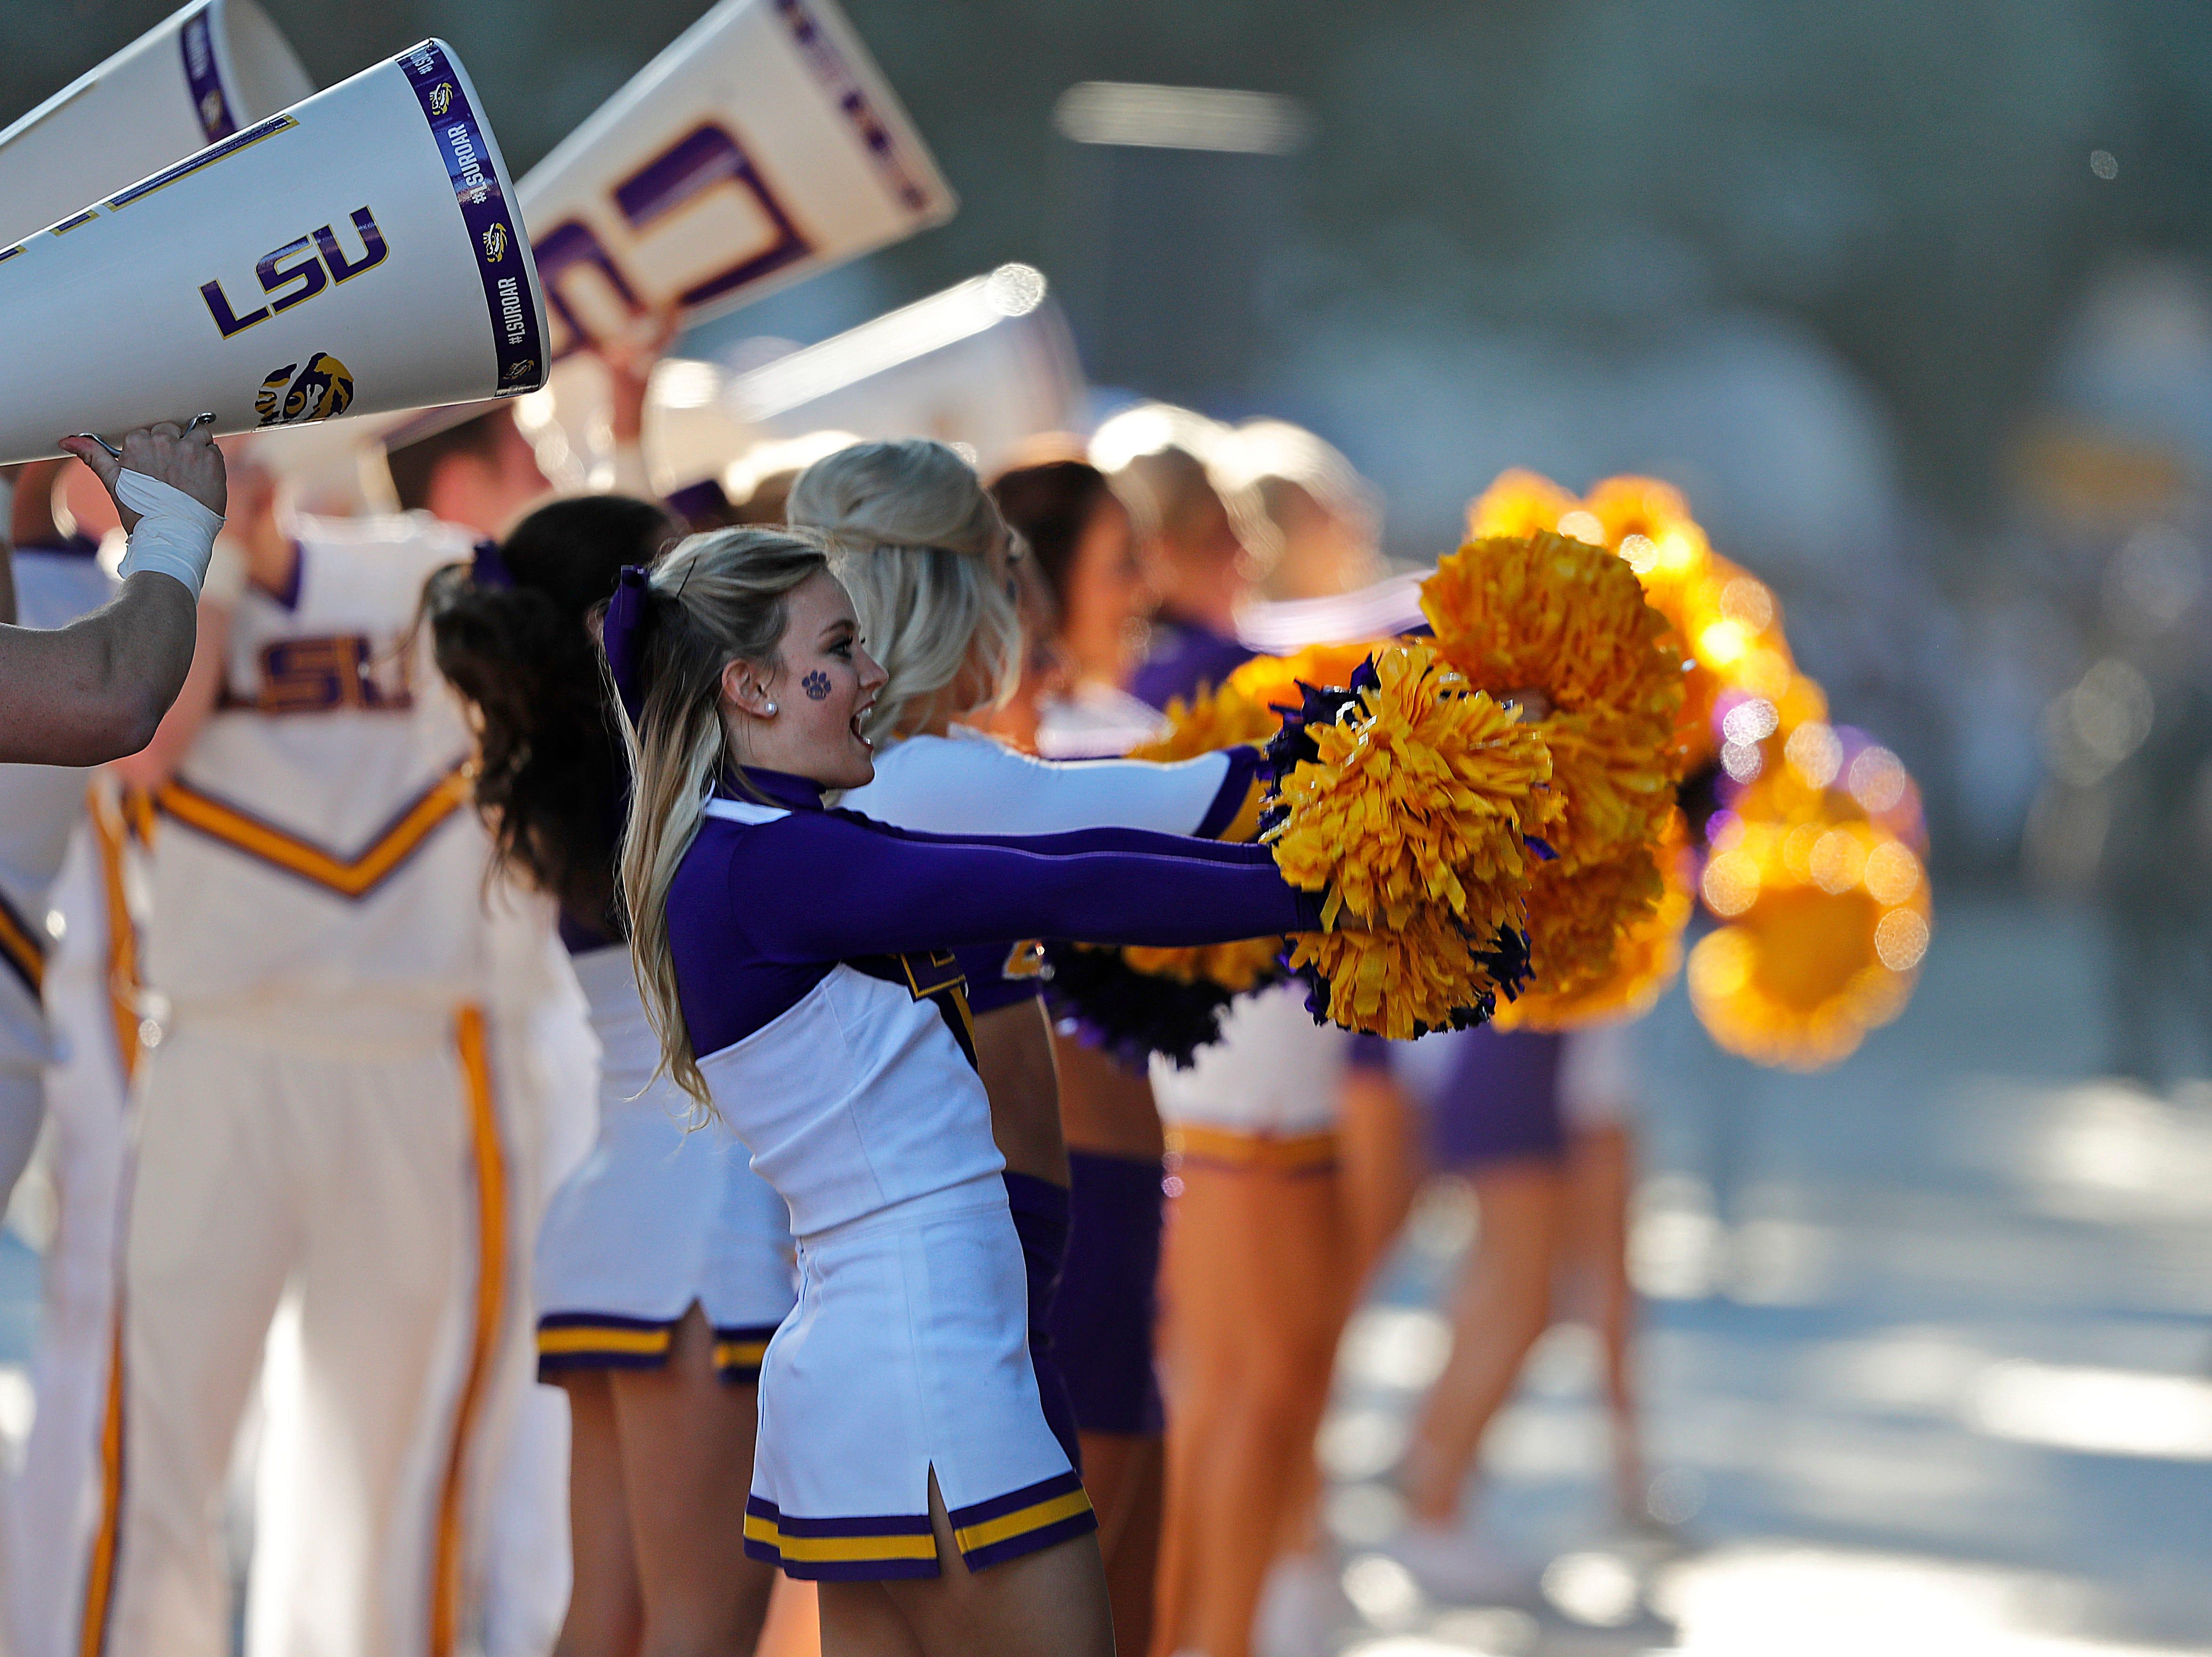 LSU cheerleaders fire up the crowd before an NCAA college football game against Alabama in Baton Rouge, La., Saturday, Nov. 3, 2018. (AP Photo/Gerald Herbert)